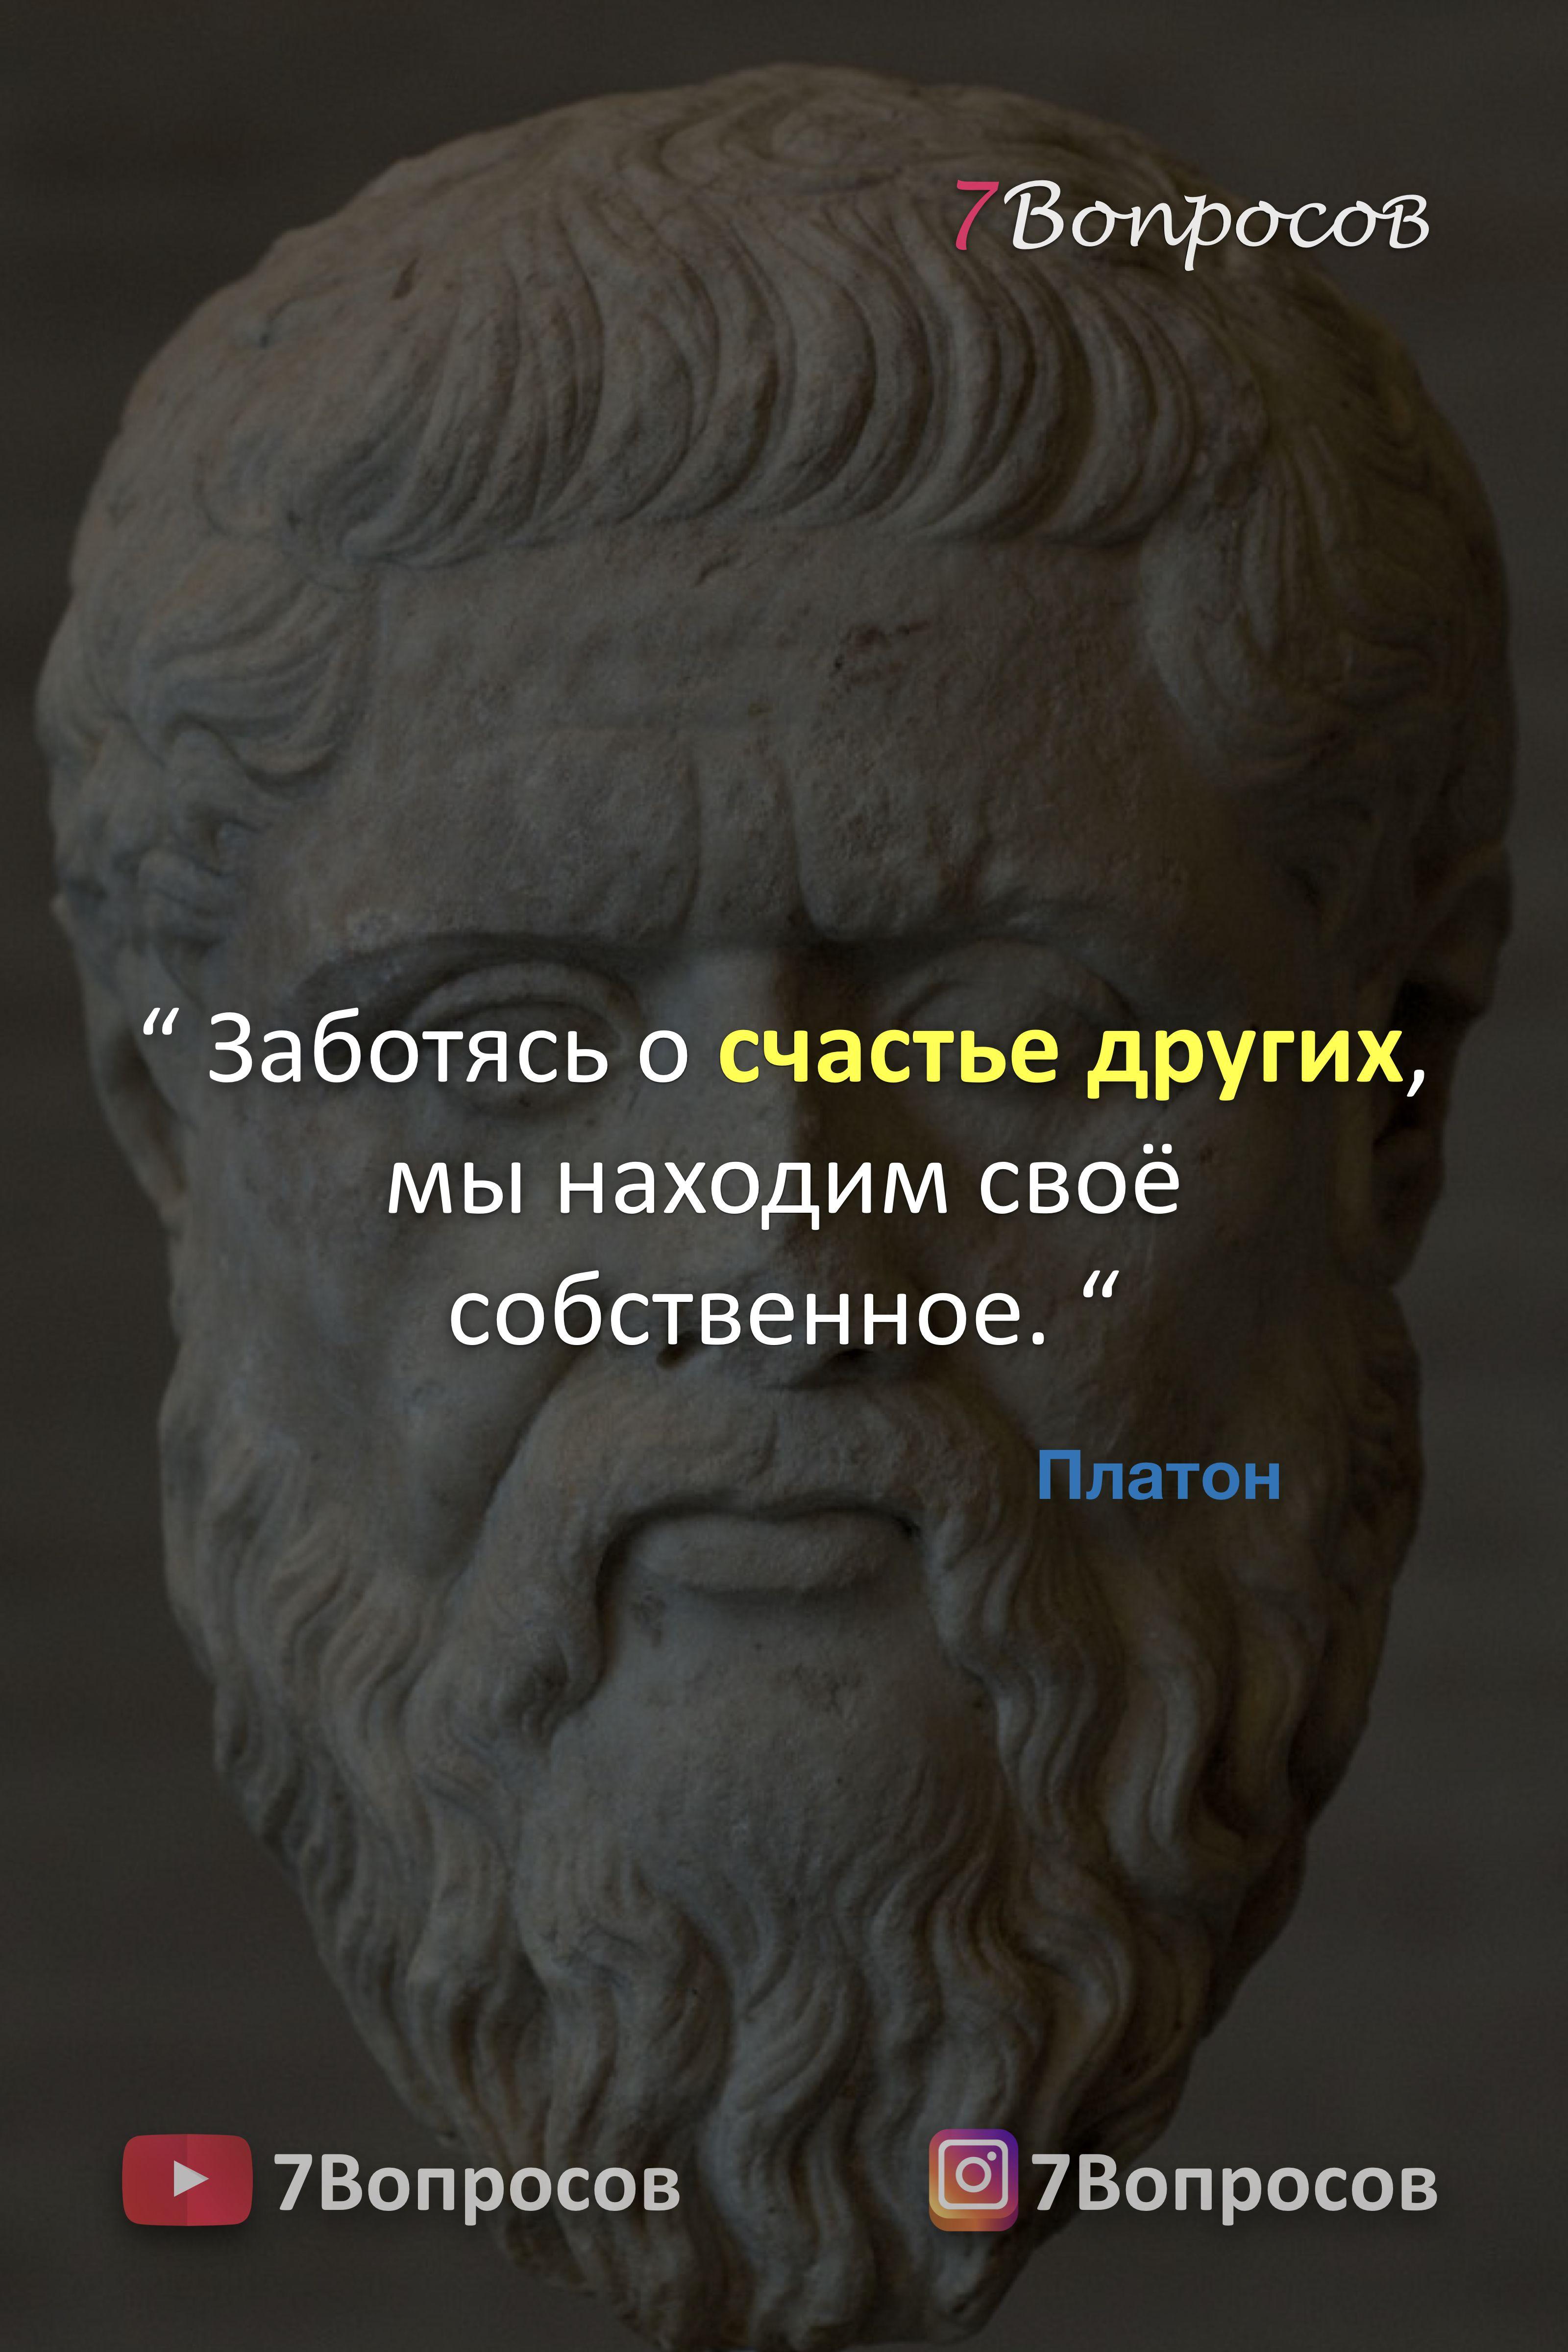 Photo of Цитаты мыслителей. Платон.